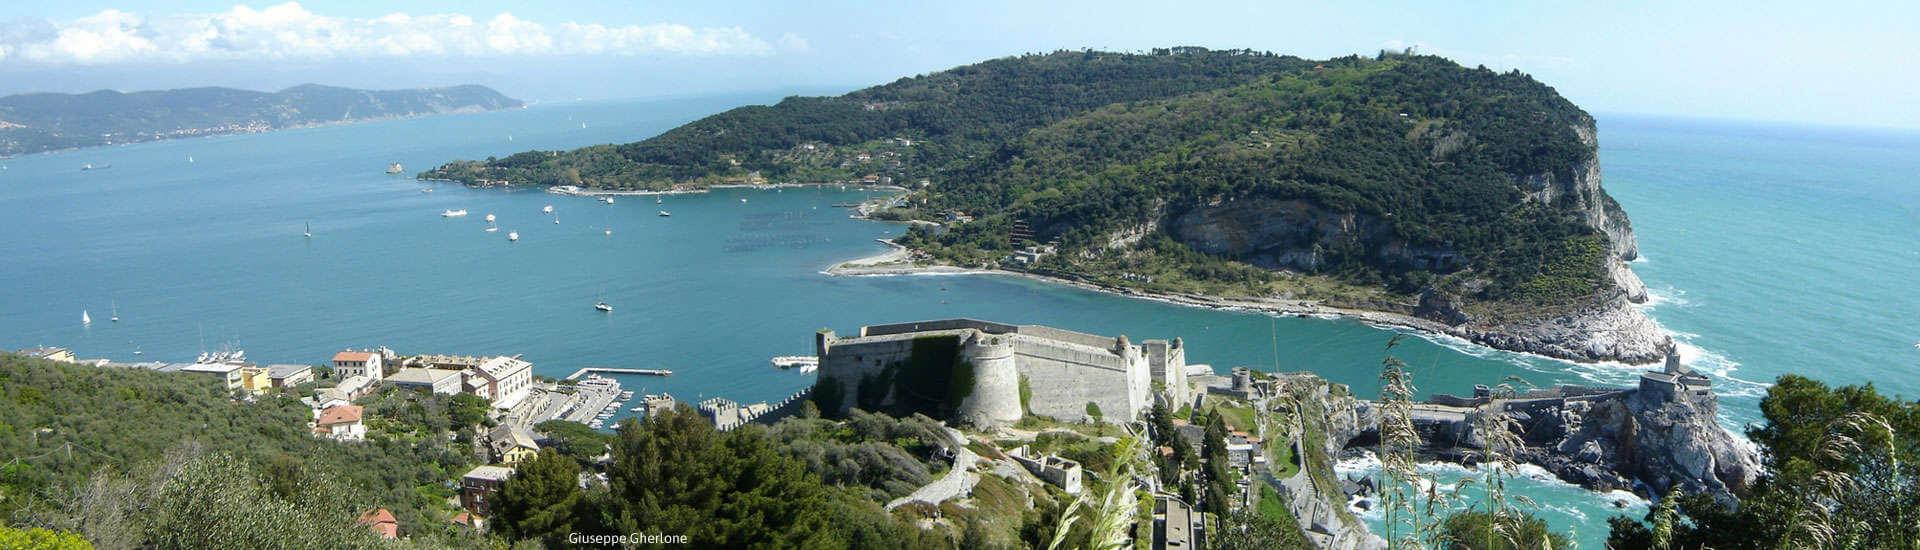 Exploring the Doria Castle in Portovenere, Liguria